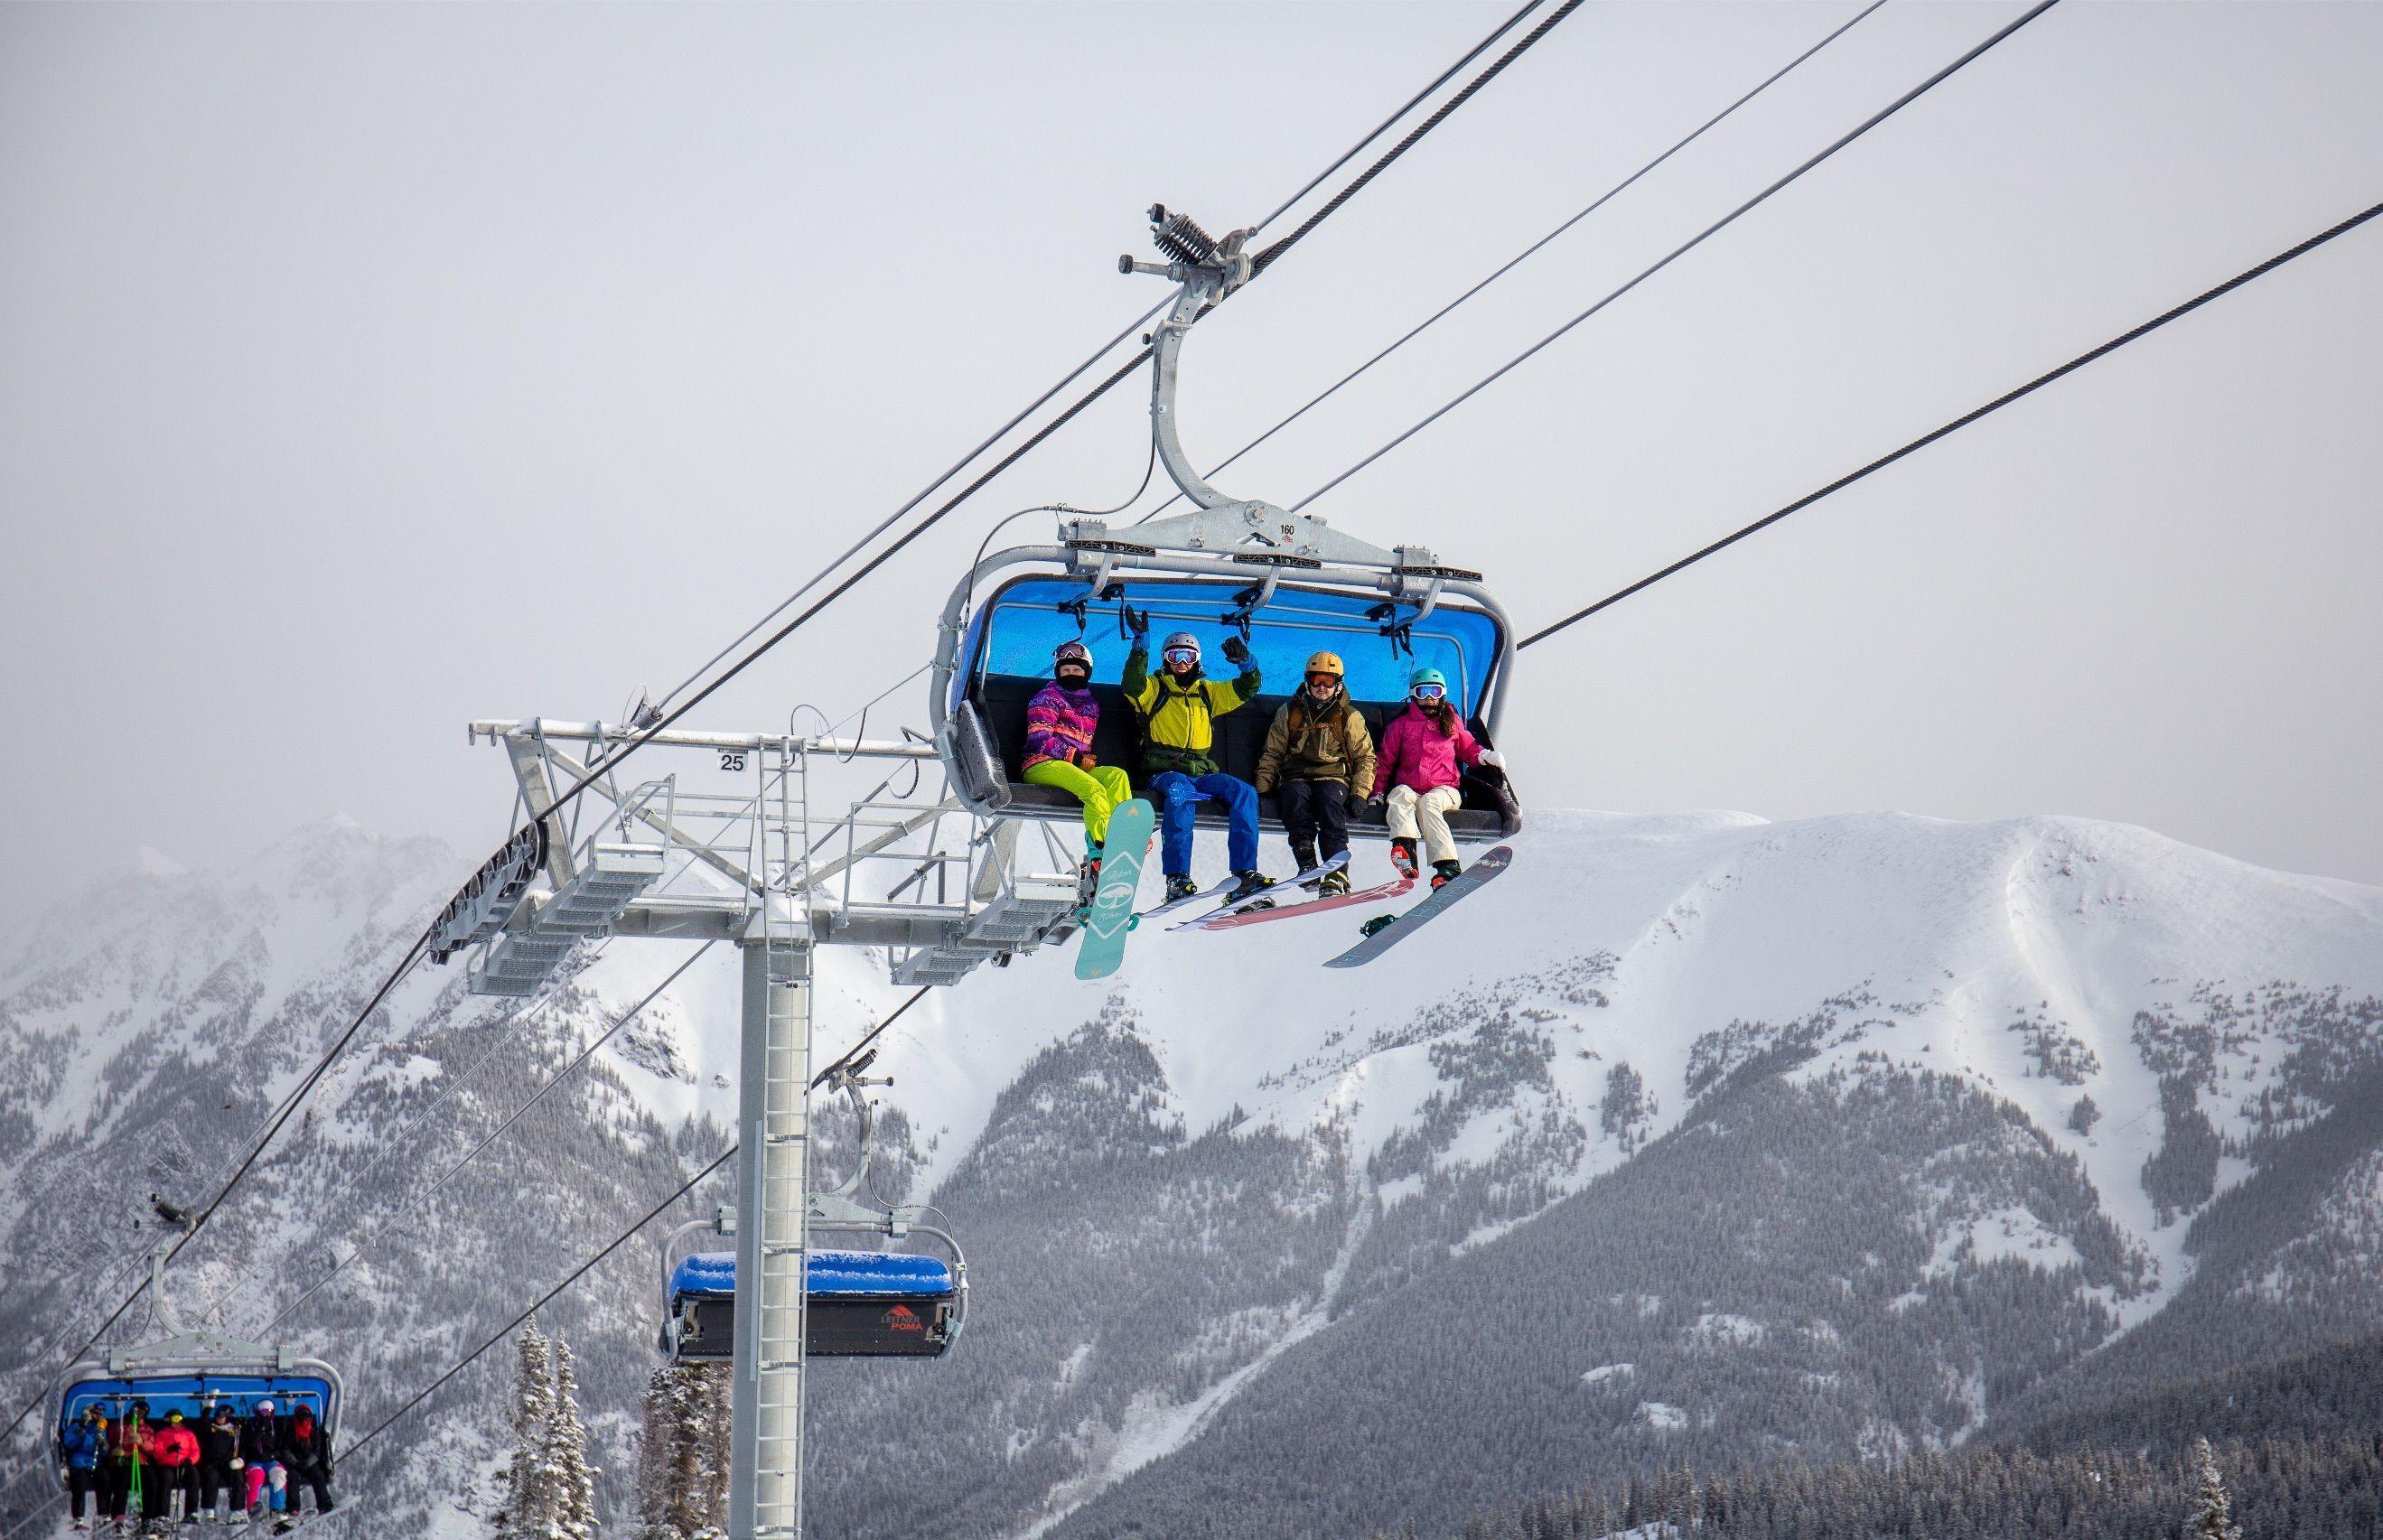 Follow Us On Instagram Colorado Ski Resort Landscape Photography Drone Nature Ski Lift Gon Colorado Ski Resorts Colorado Skiing Copper Mountain Ski Resort